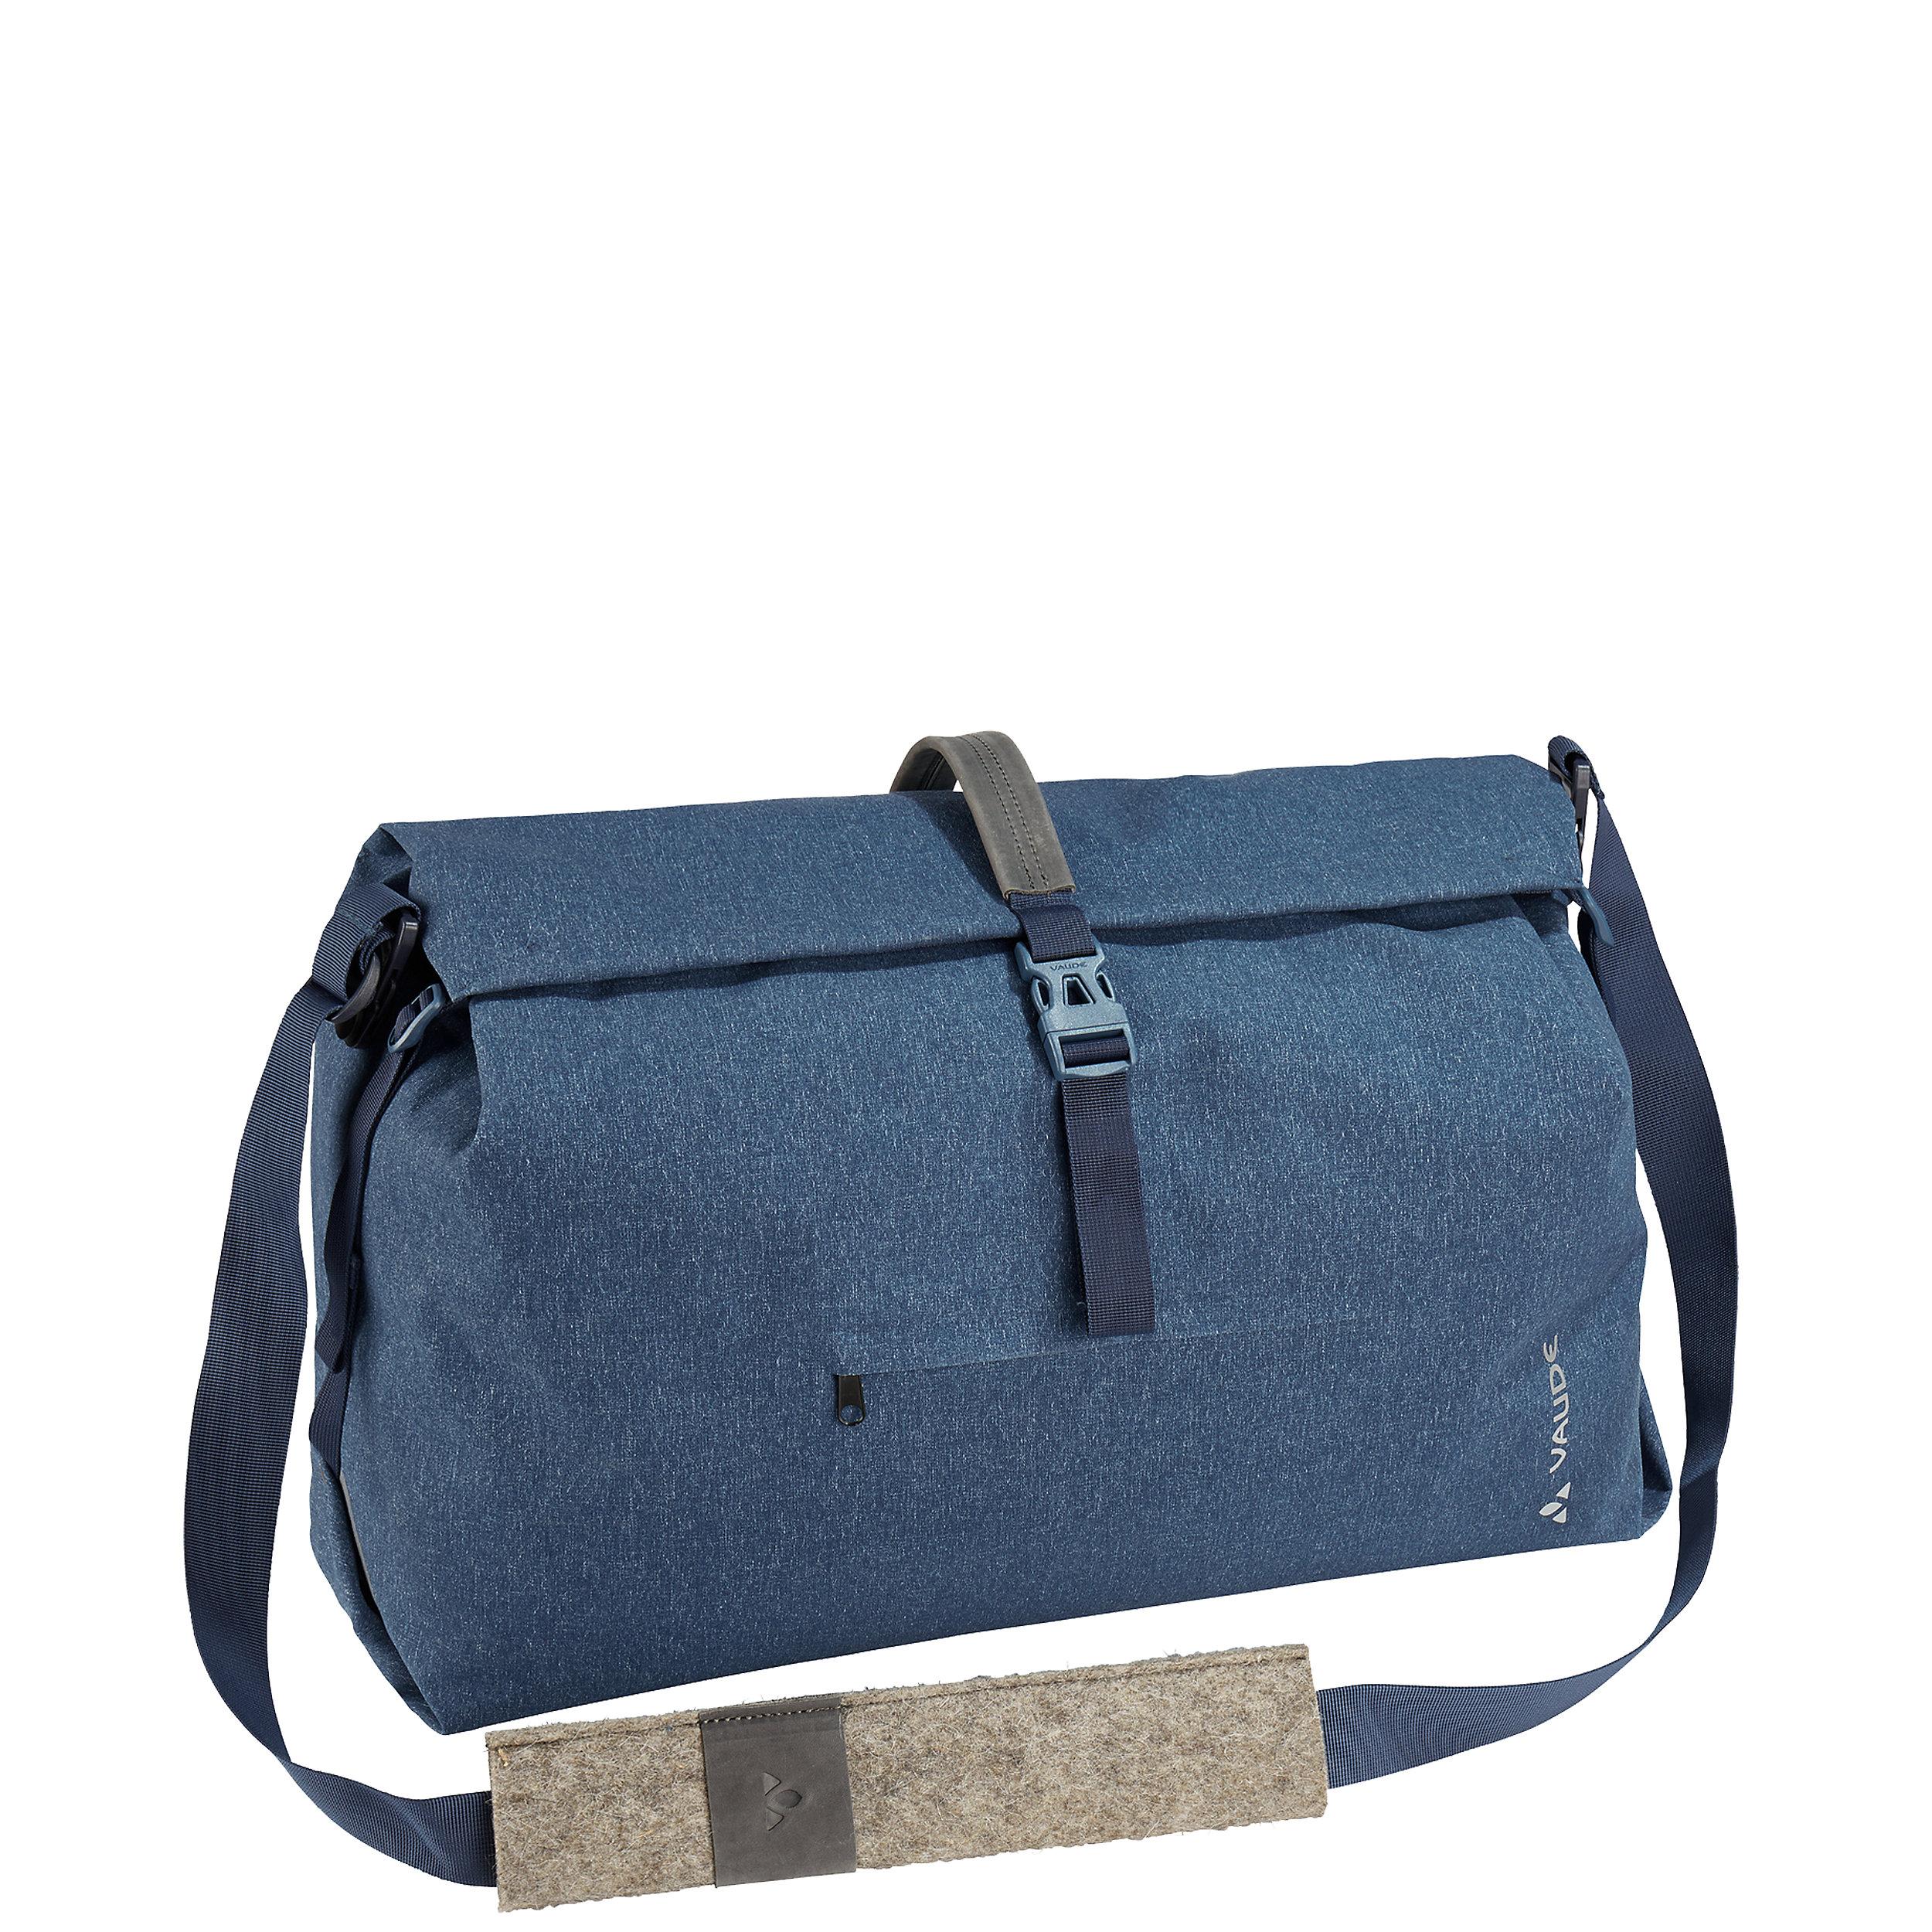 Messenger Bag Bodnegg Made in Germany 35 Liter